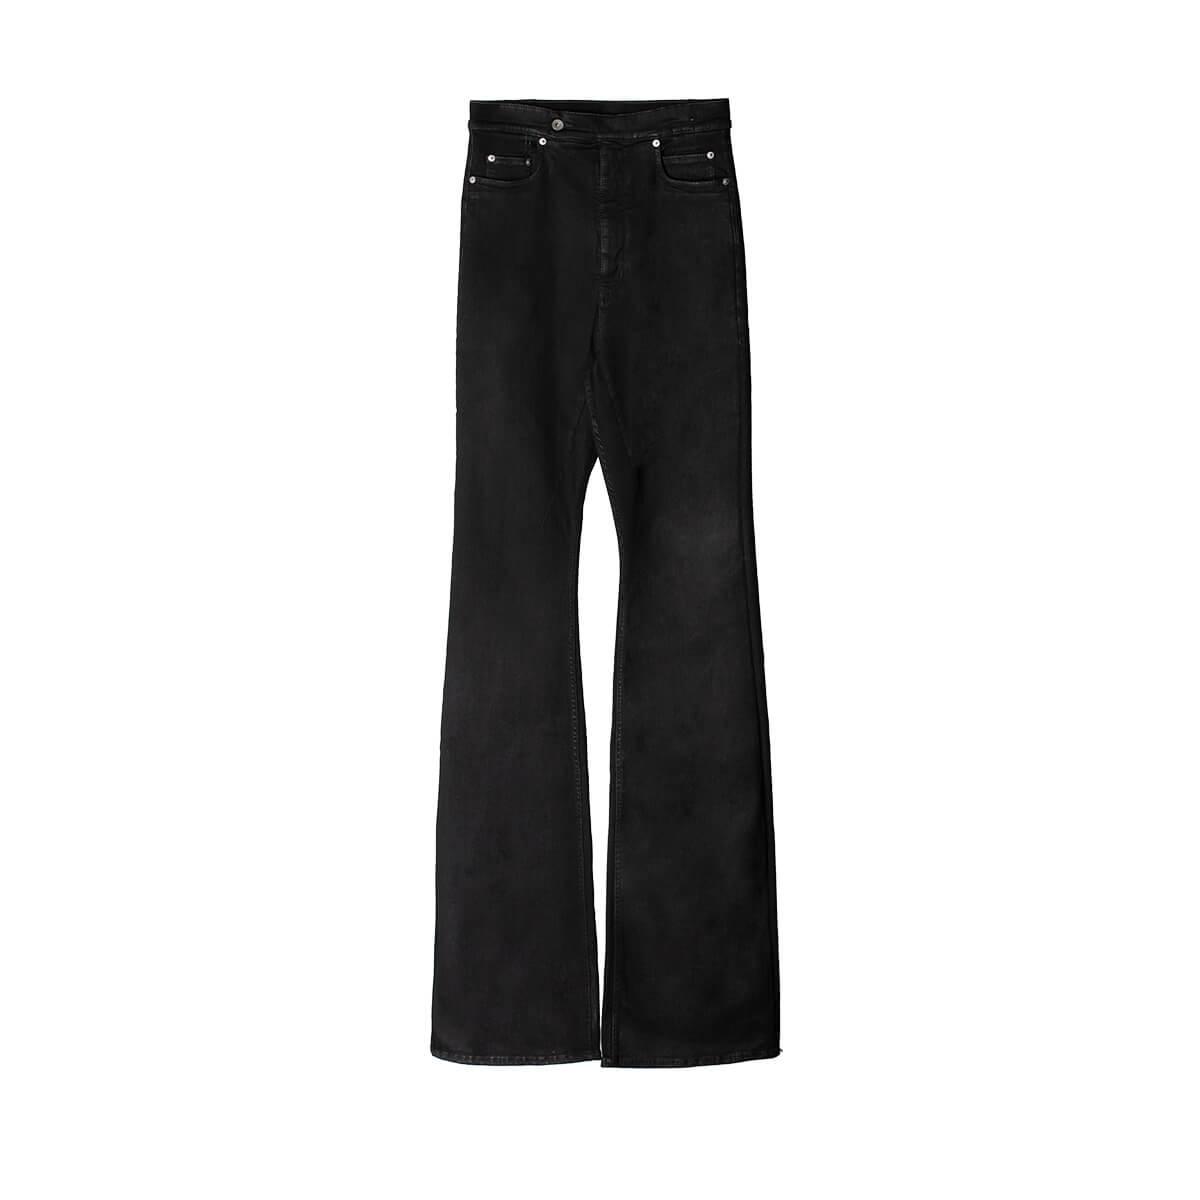 Bolans Bootcut Pants